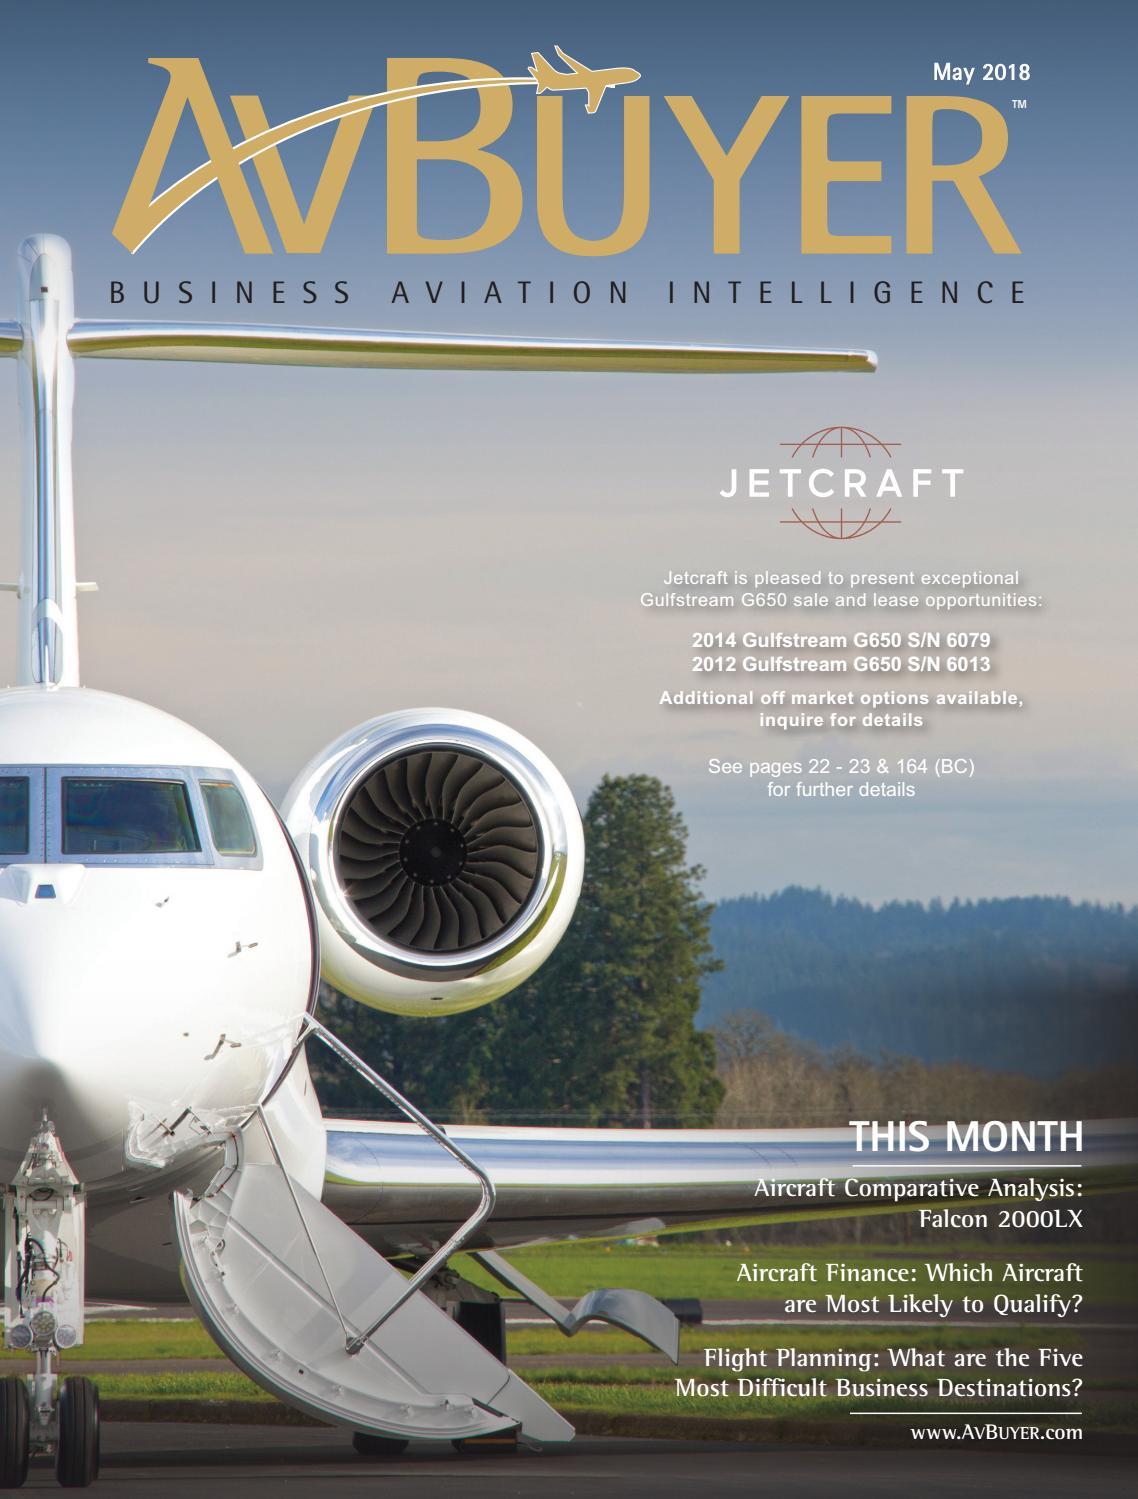 AvBuyer Magazine May 2018 by AvBuyer Ltd  - issuu